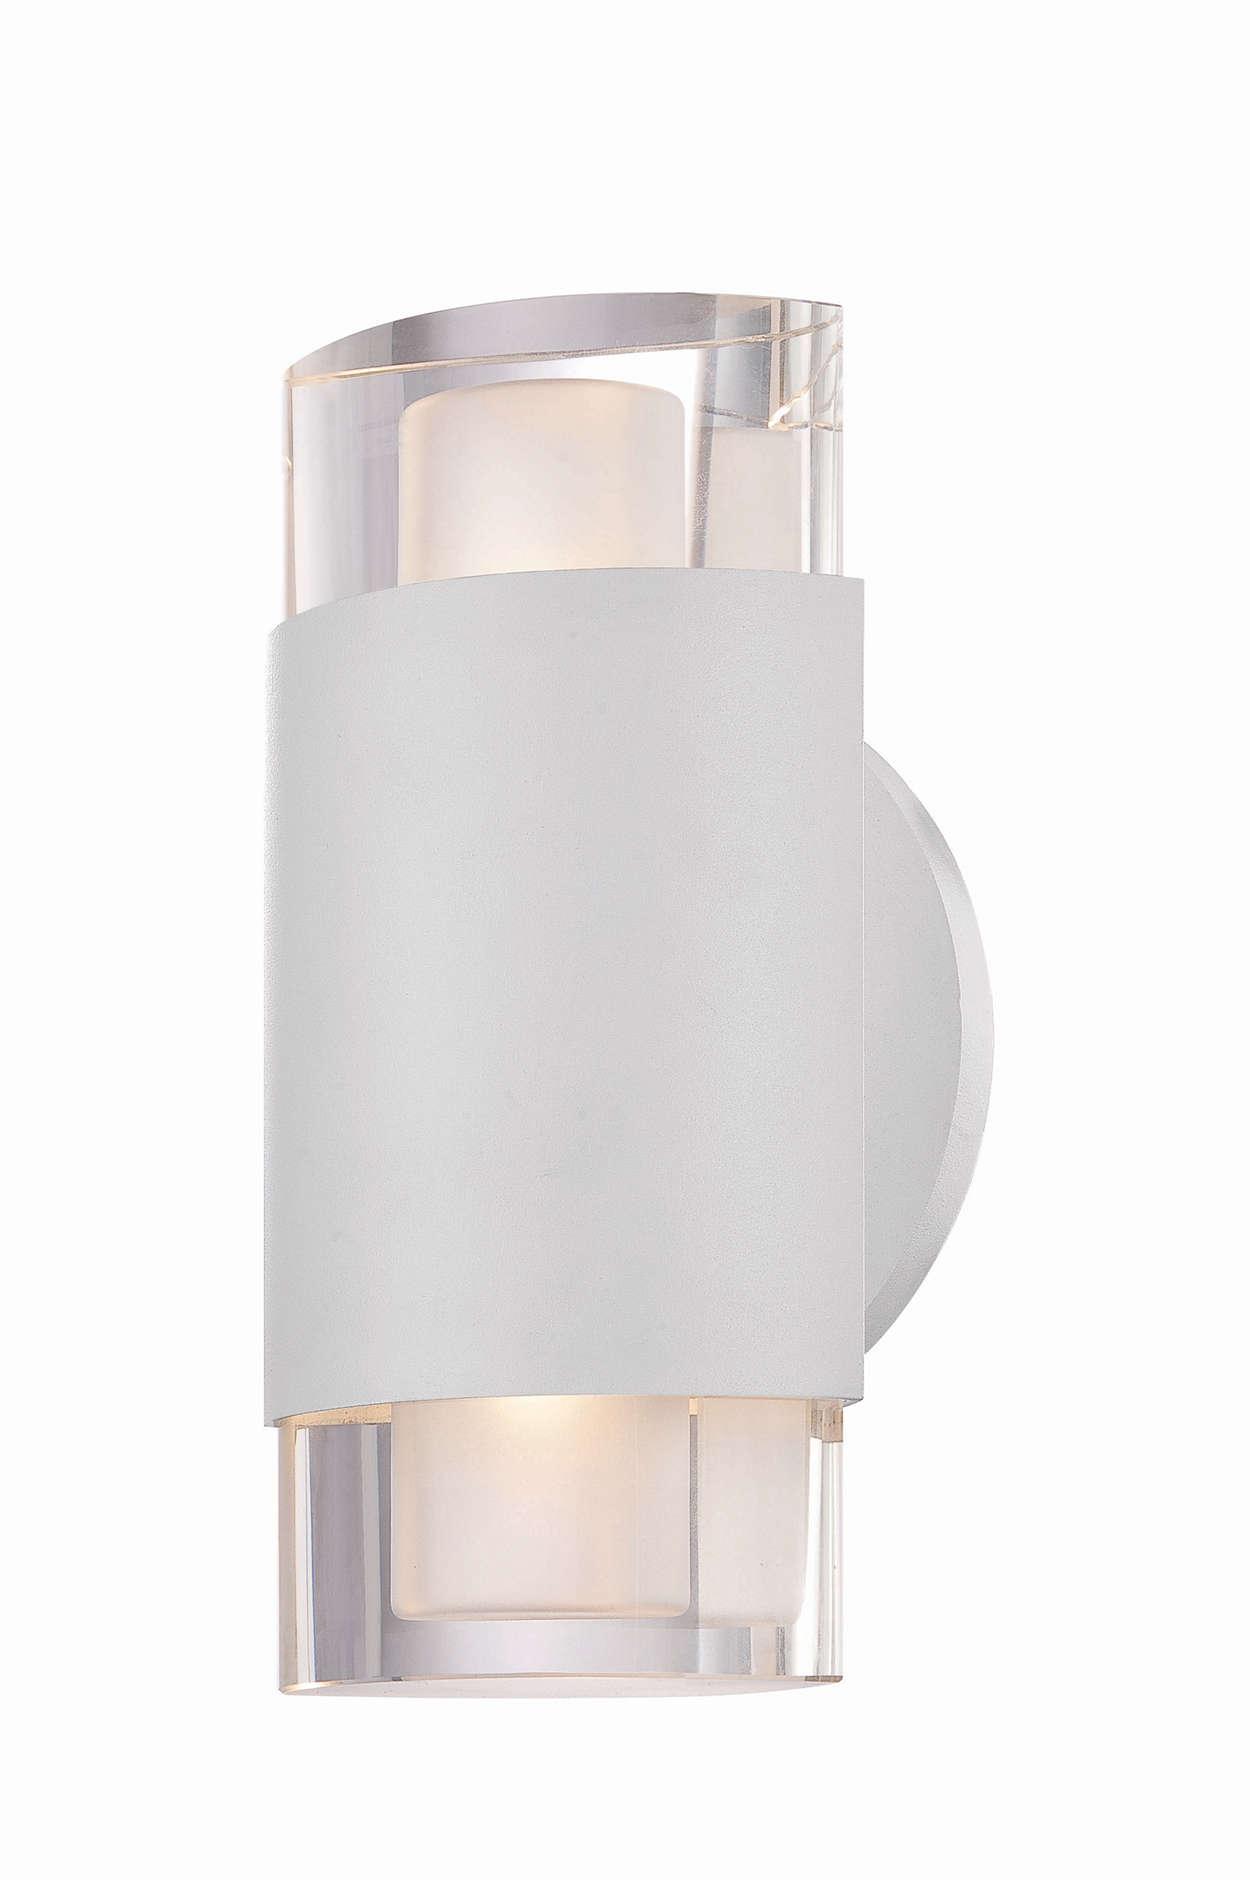 Marchesa LED wall light